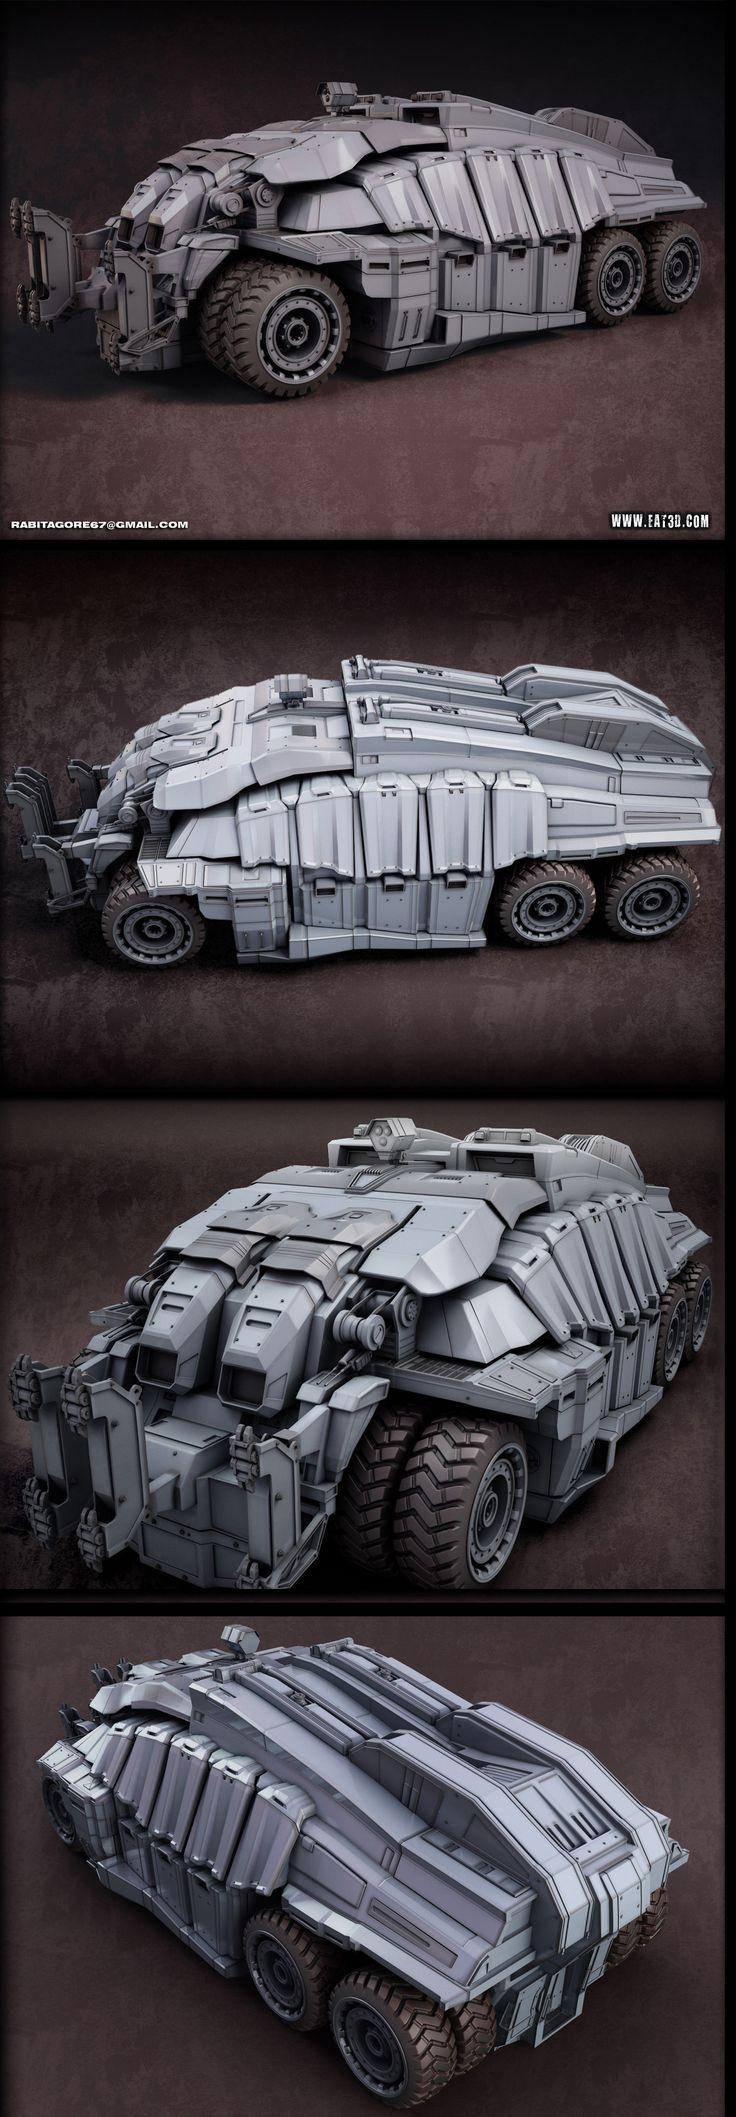 High Poly Vehicle - Rabitagore - Final   Eat 3D